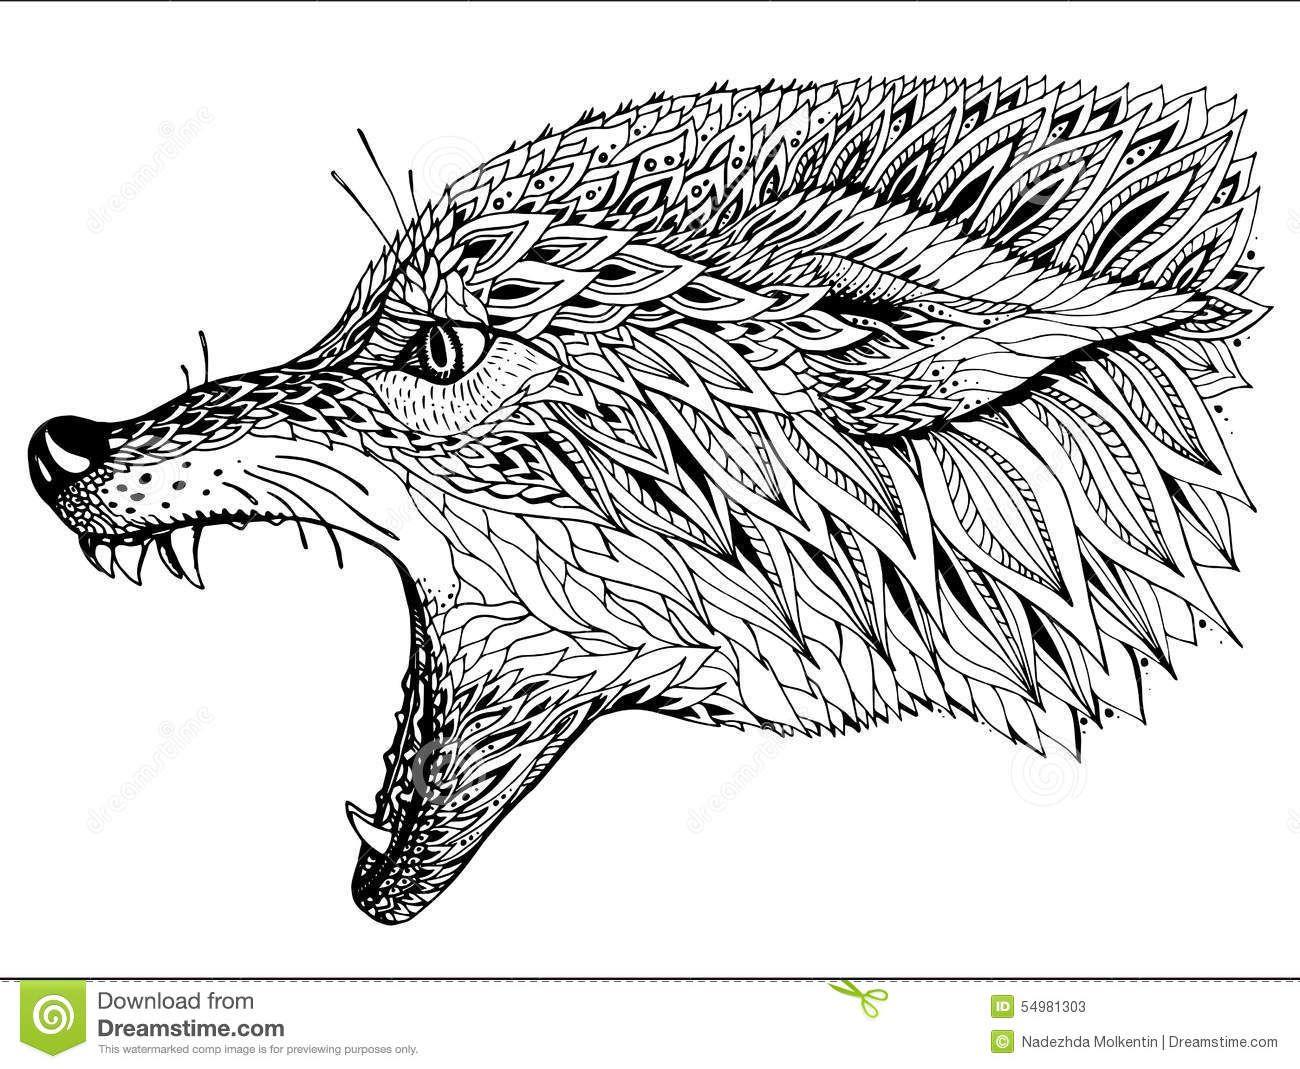 patterned-head-wolf-tribal-ethnic-totem-tattoo-design-hand-drawn ...